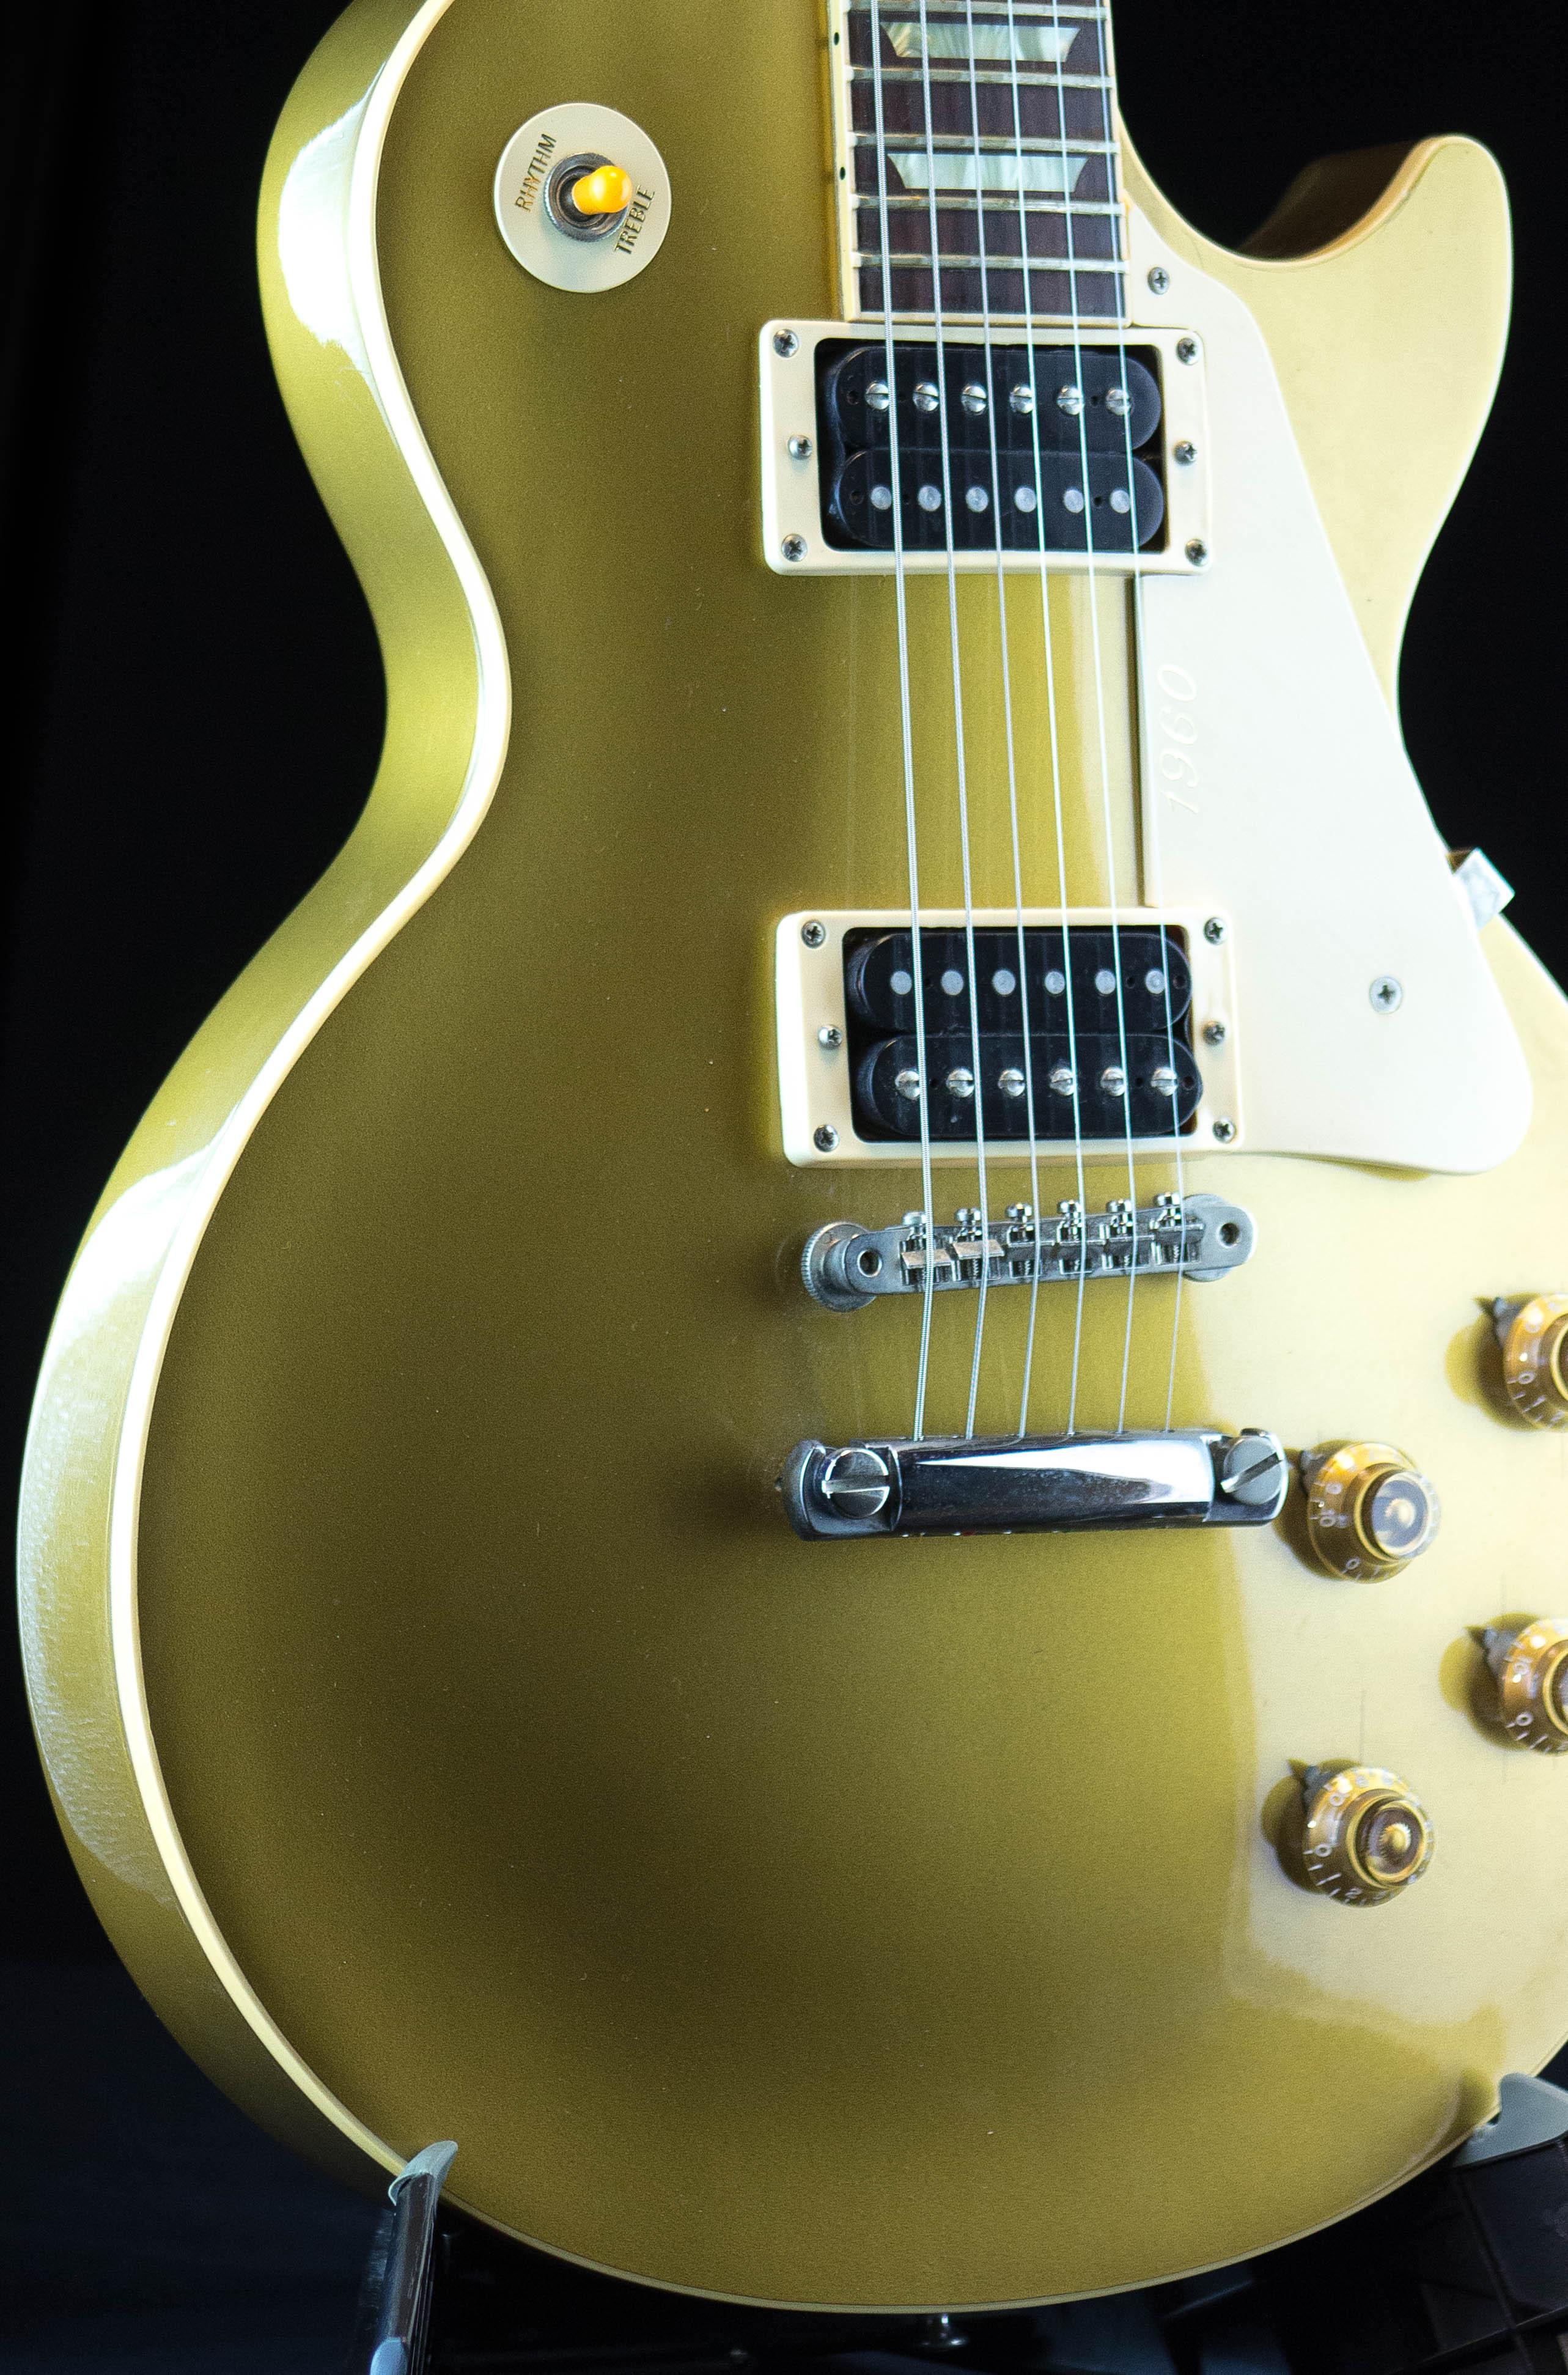 gibson 500t pickup wiring diagram plot powerpoint 1991 les paul classic goldtop bullion guitar